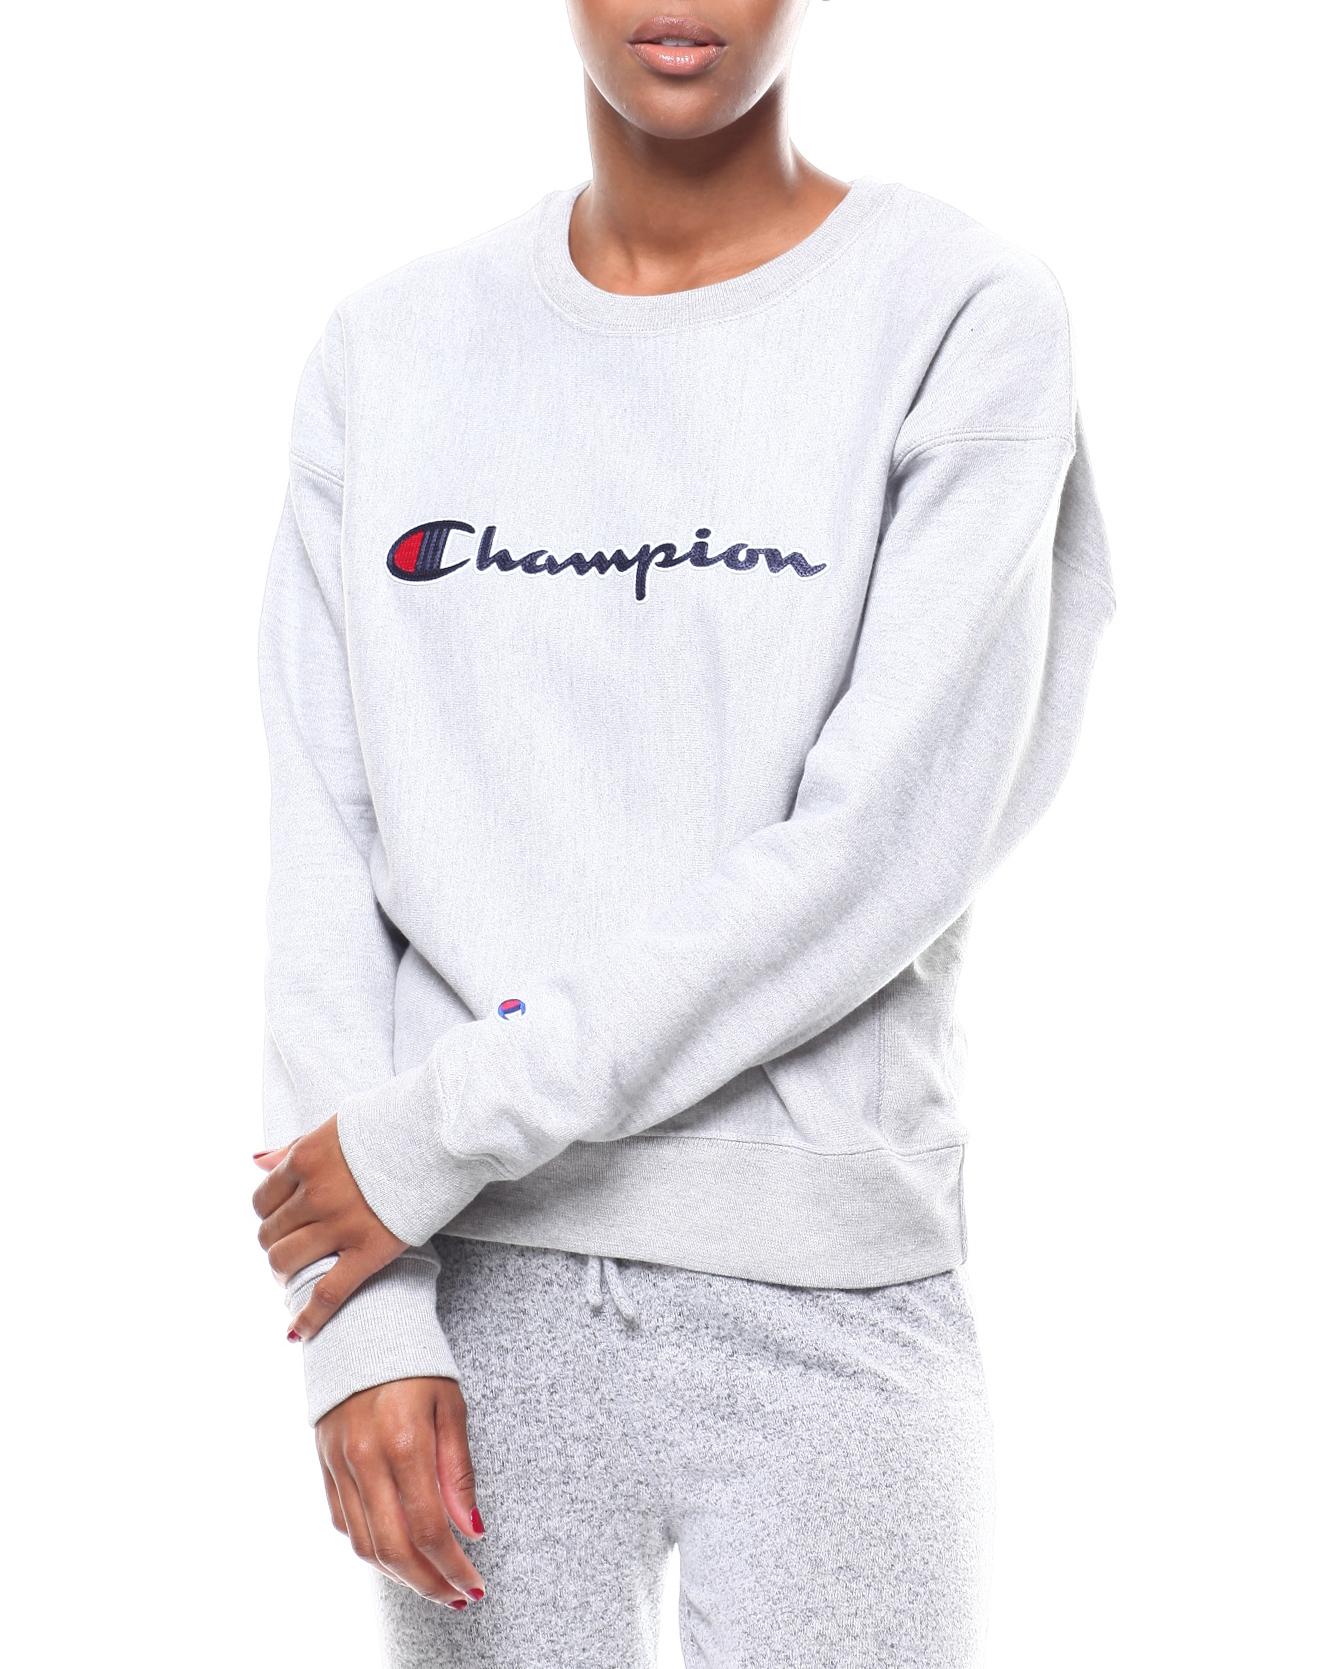 01cc8ea19ca9 Buy Chainstitch Champion Script RW Crewneck Women's Tops from ...